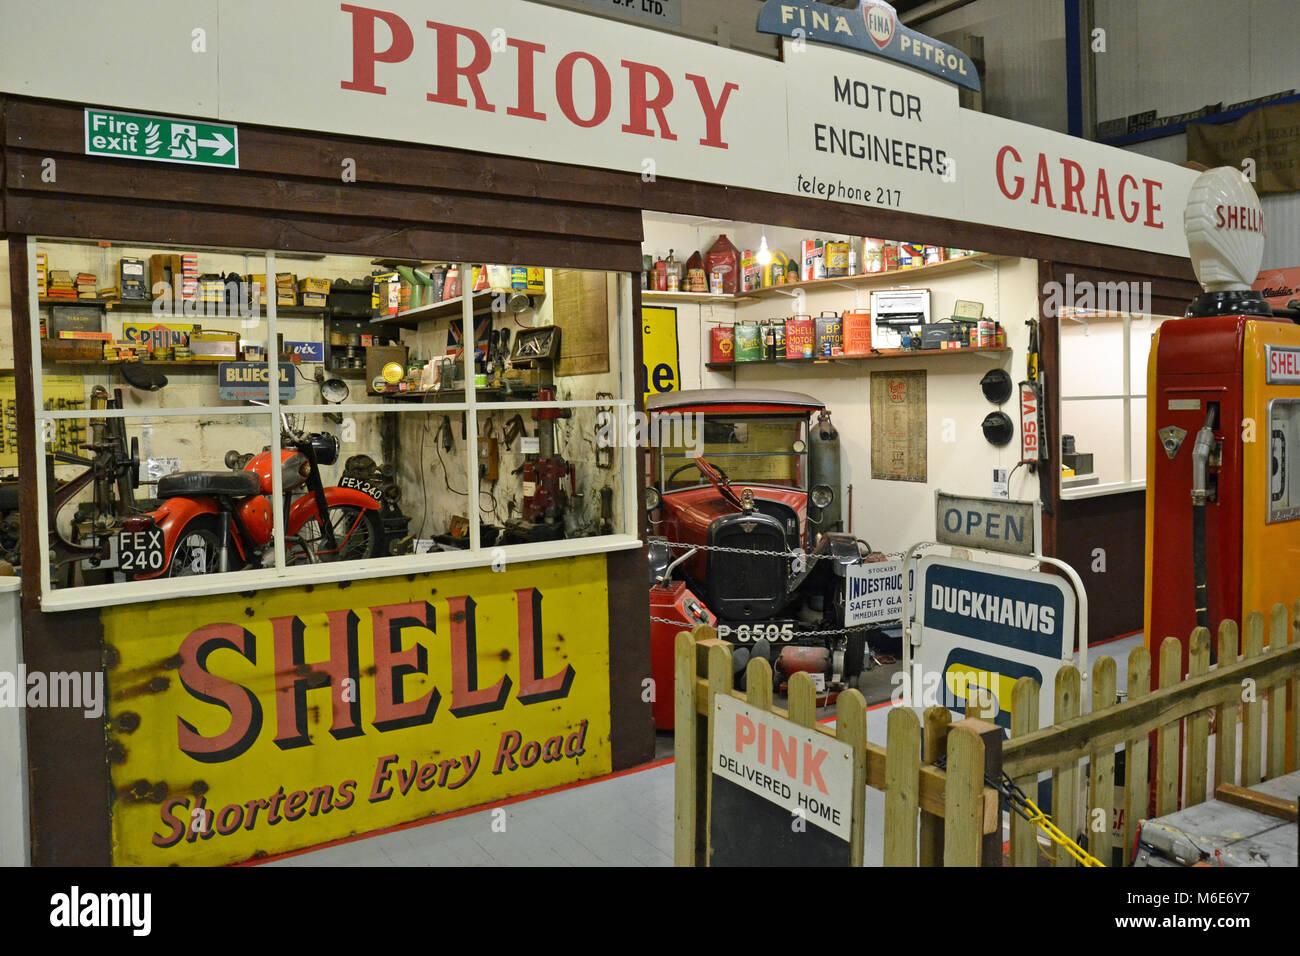 Motor vehicle workshop at Ipswich Transport Museum, Suffolk, England - Stock Image